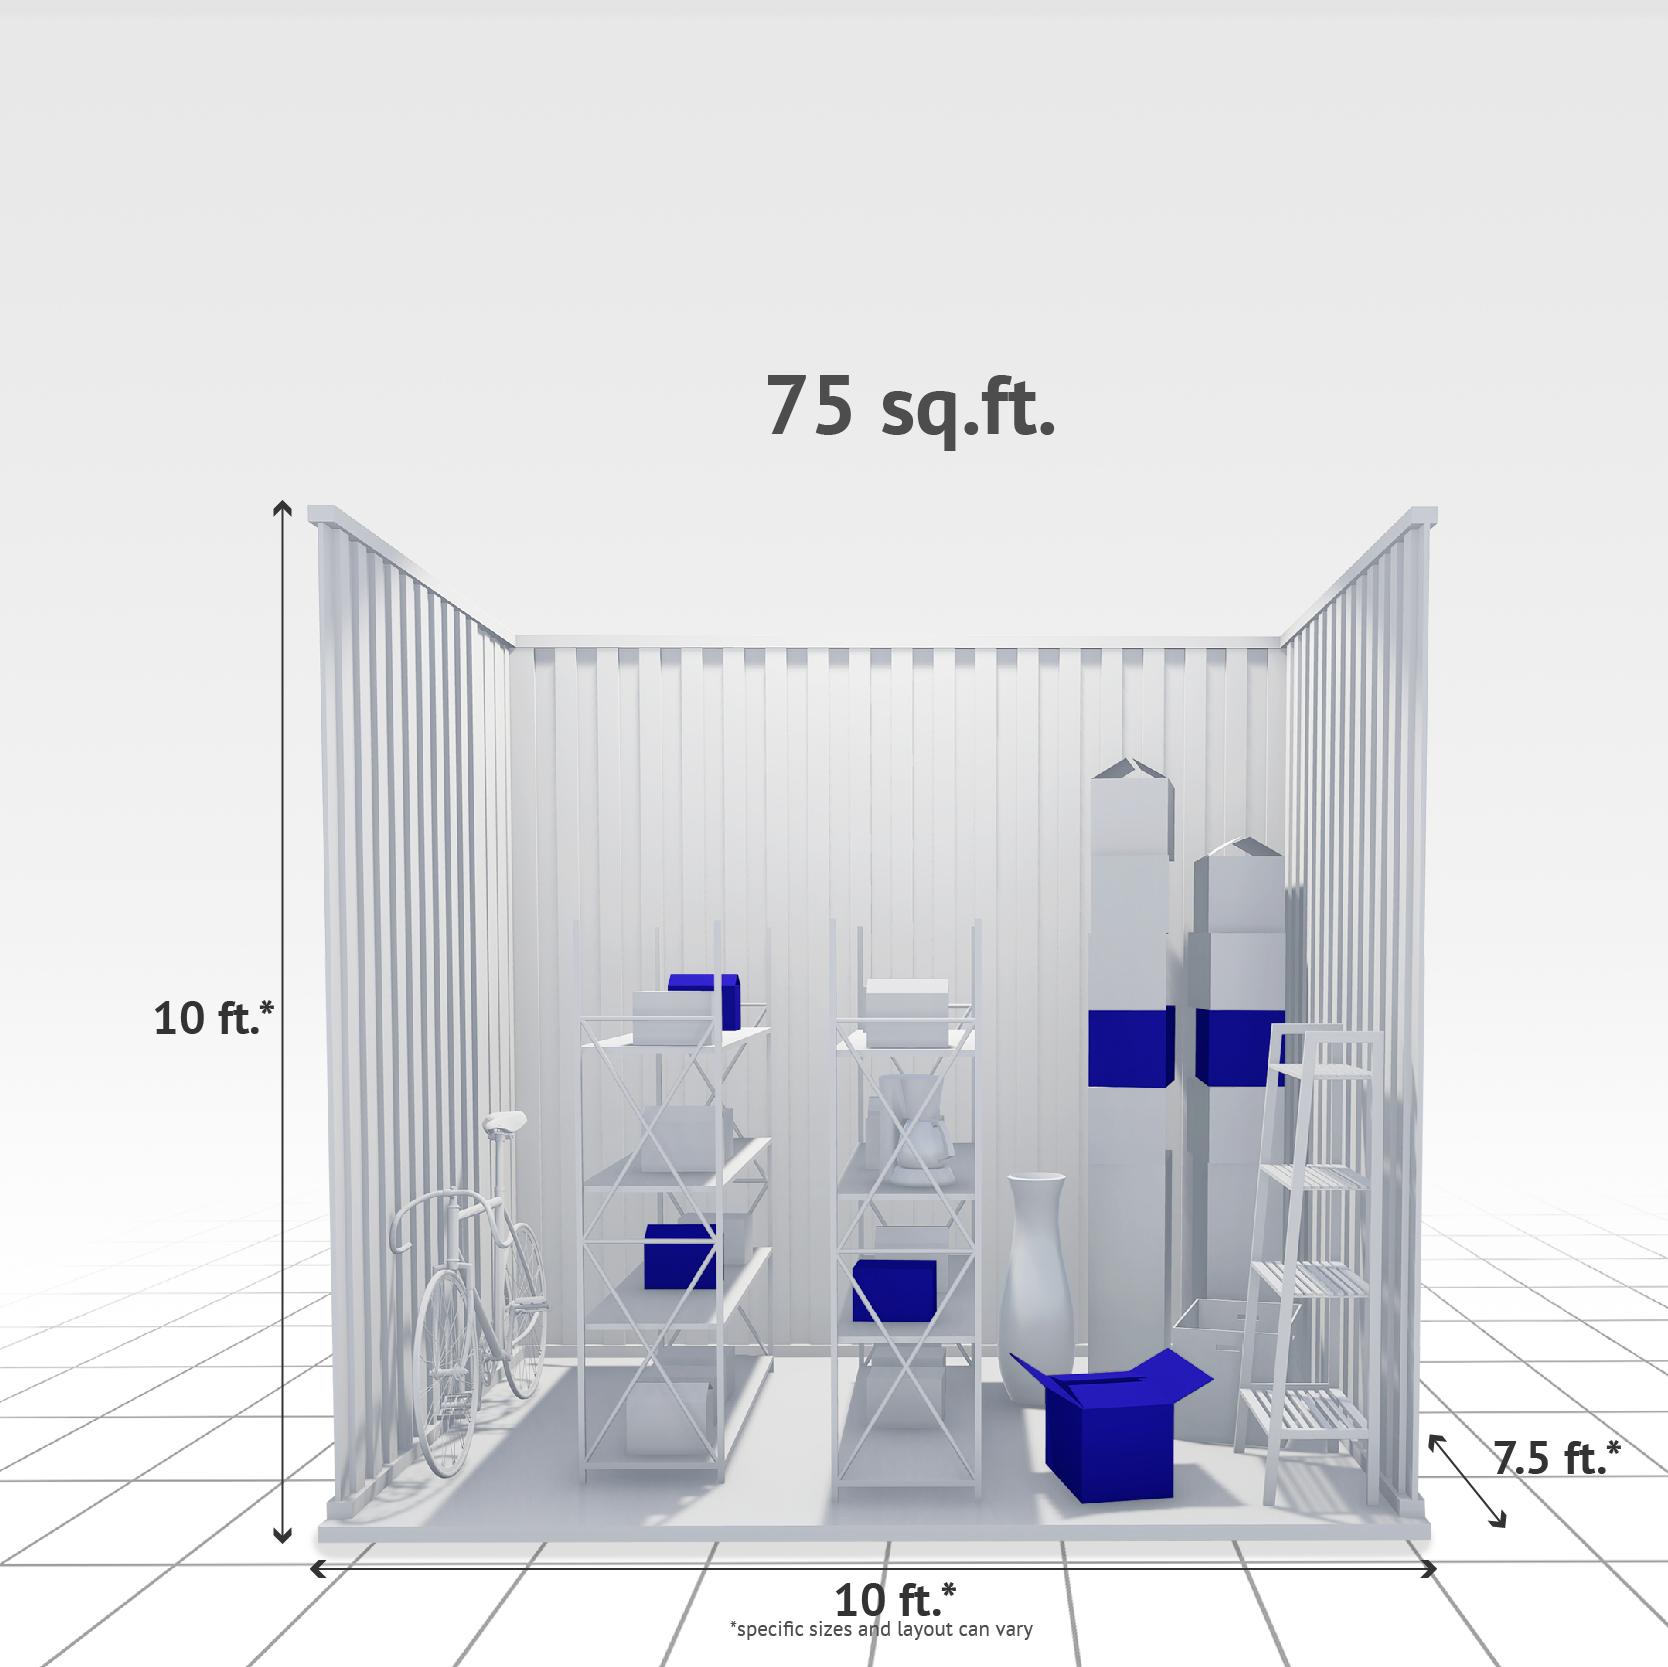 75 sq ft Internal Storage Unit